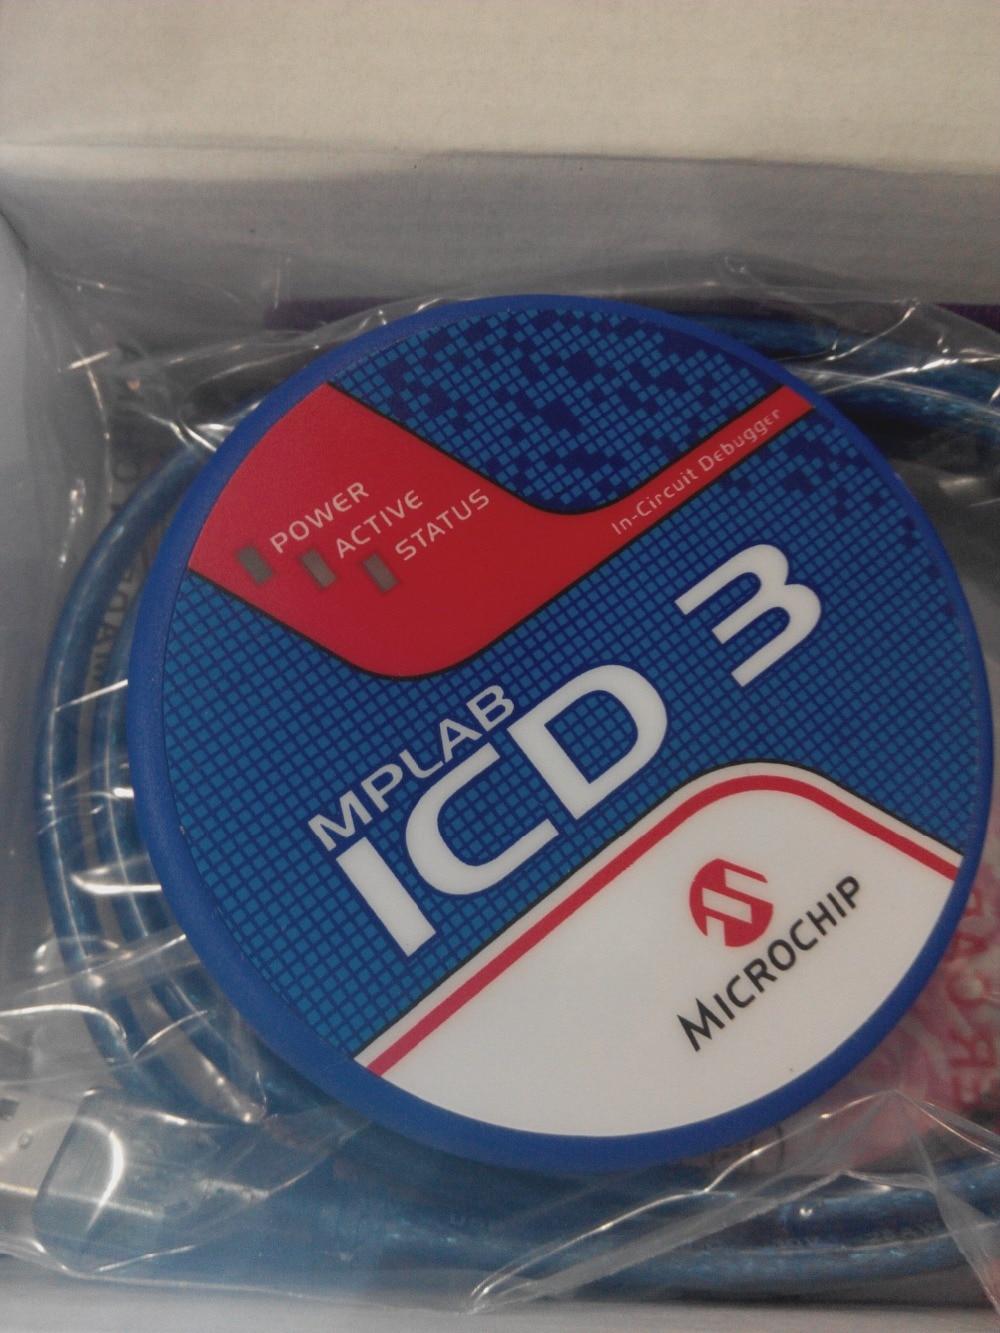 MPLAB Microchip  ICD3 simulator programmer MPLAB-ICD3 PIC